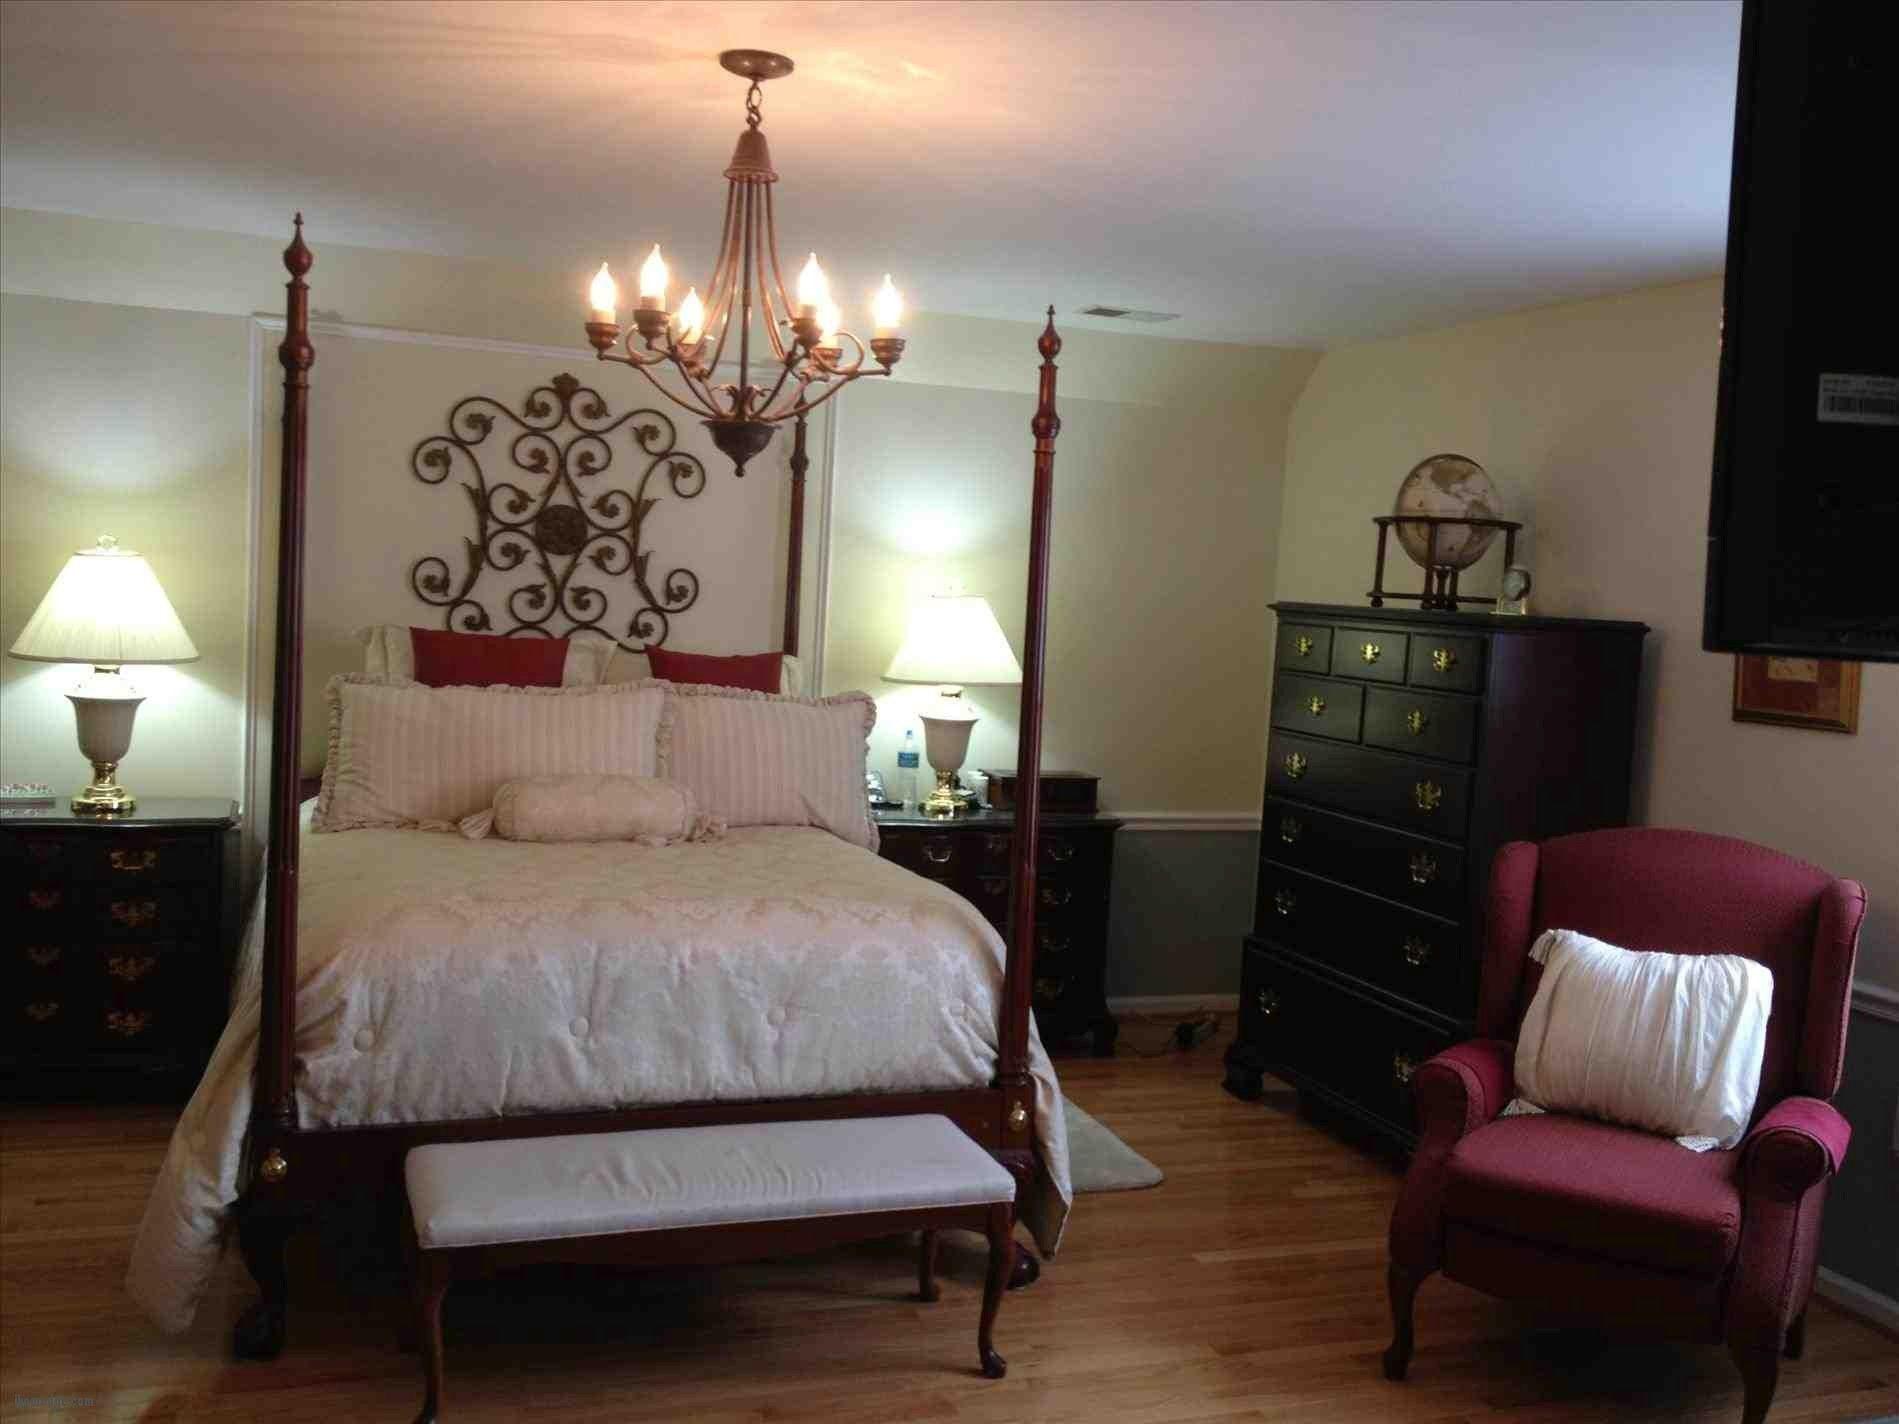 good wonderful bedroom goals goals hgtvus decorating u design blog